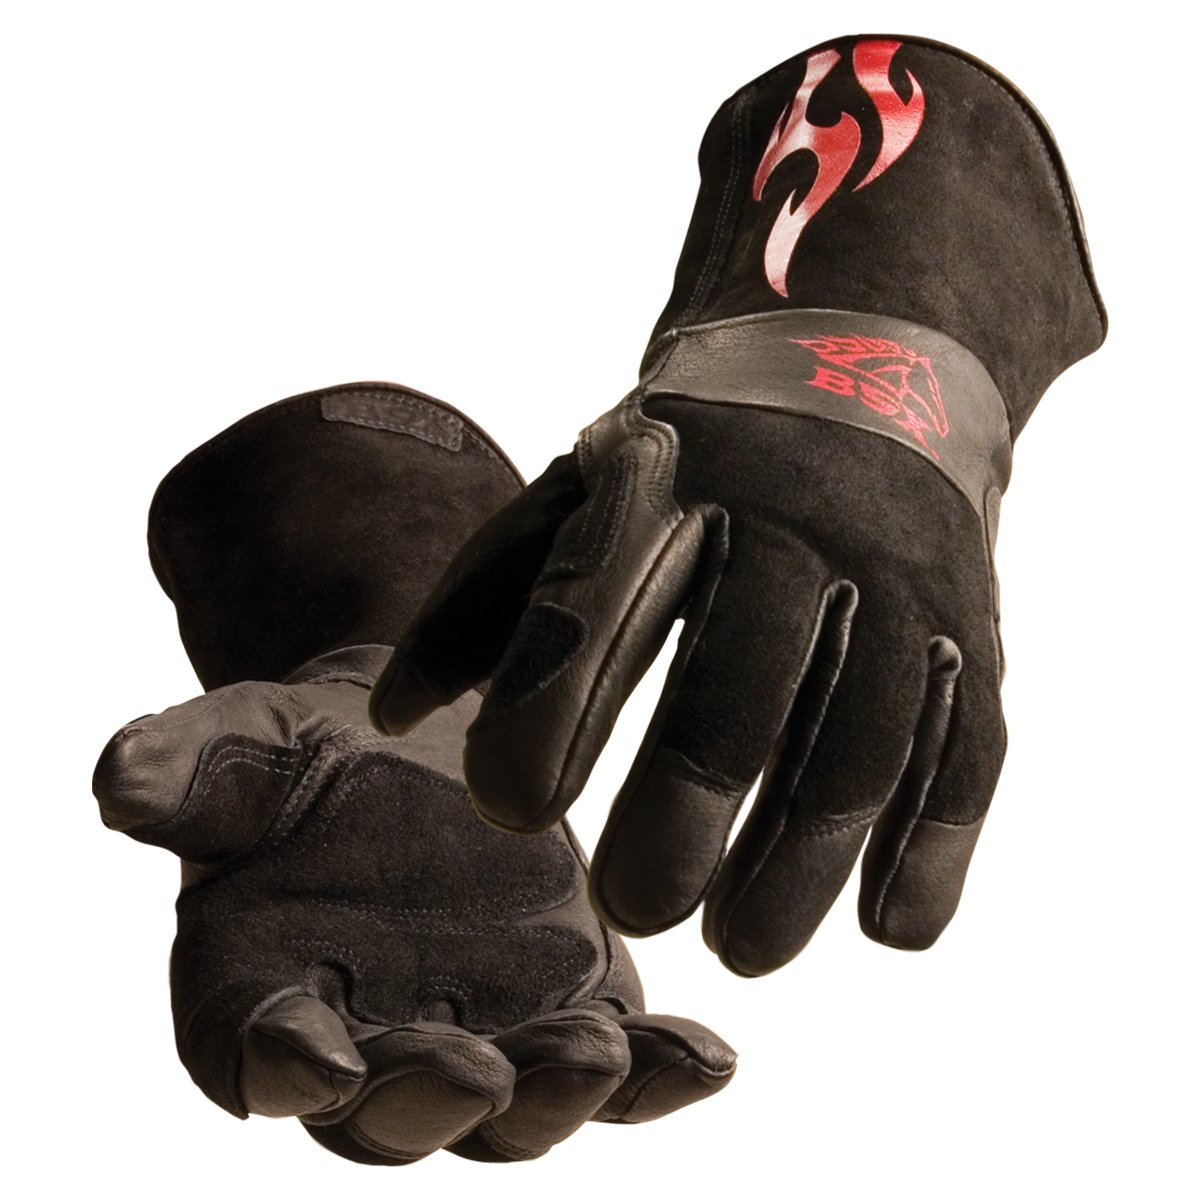 BSX Vulcan Stick/Mig Welding Gloves